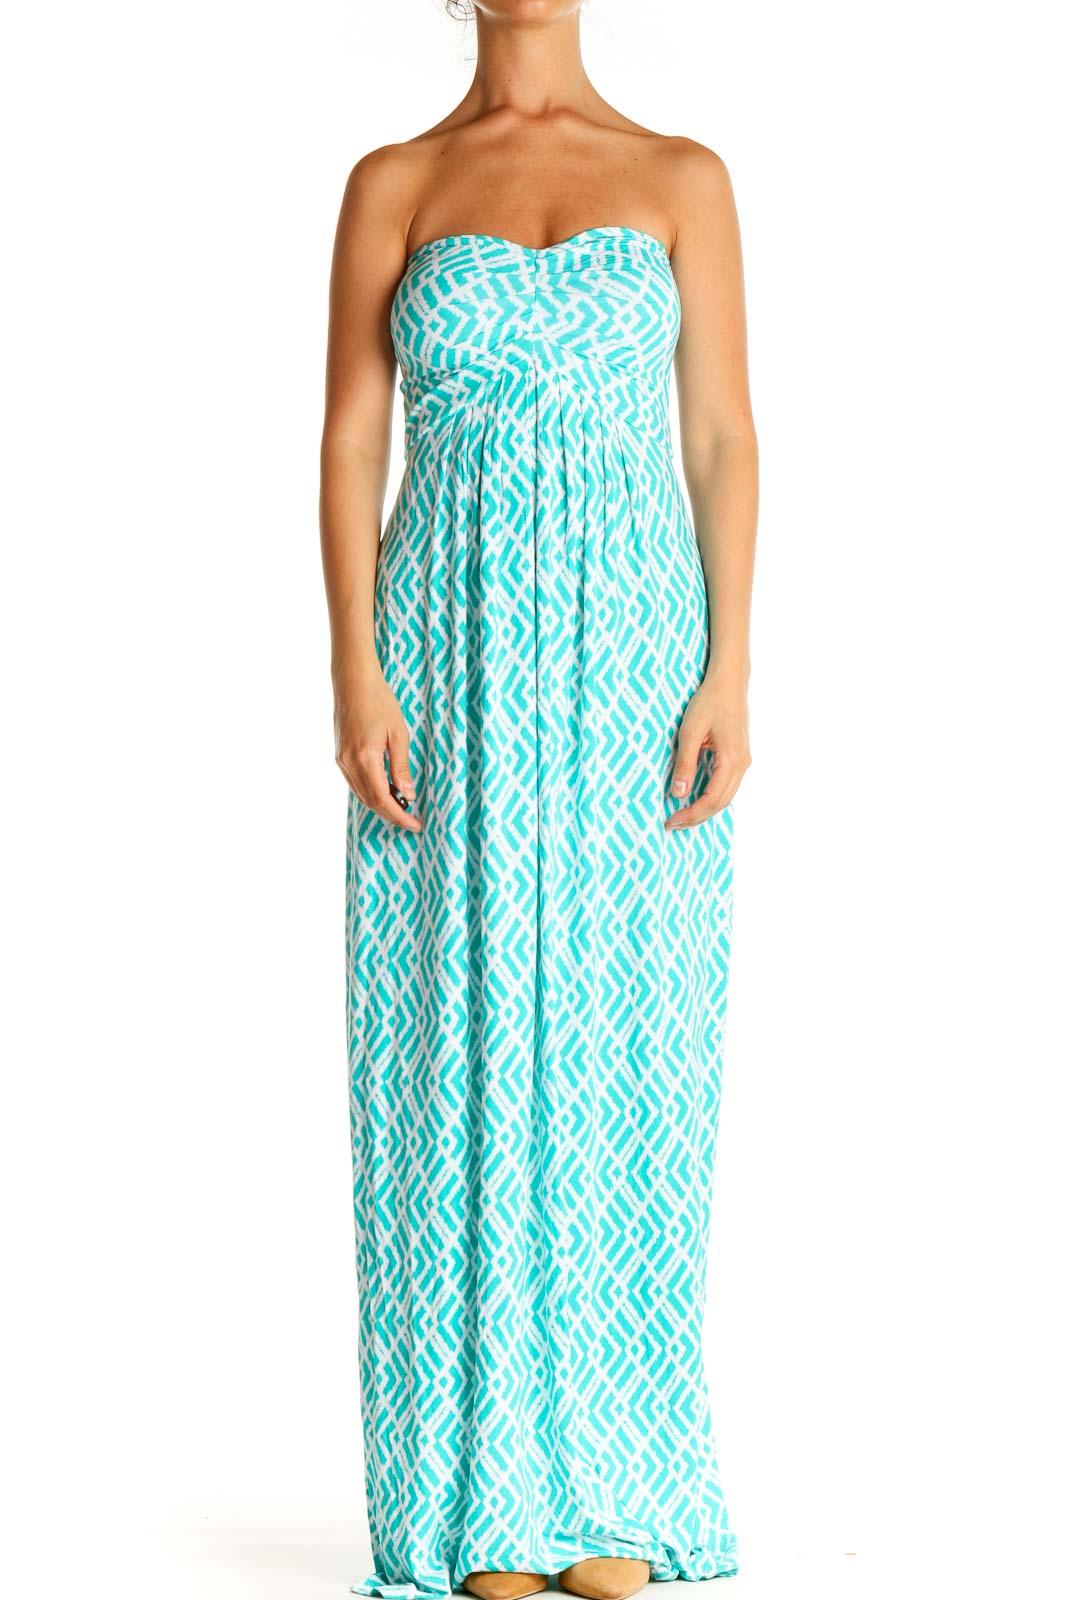 Blue Geometric Print Casual Column Dress Front